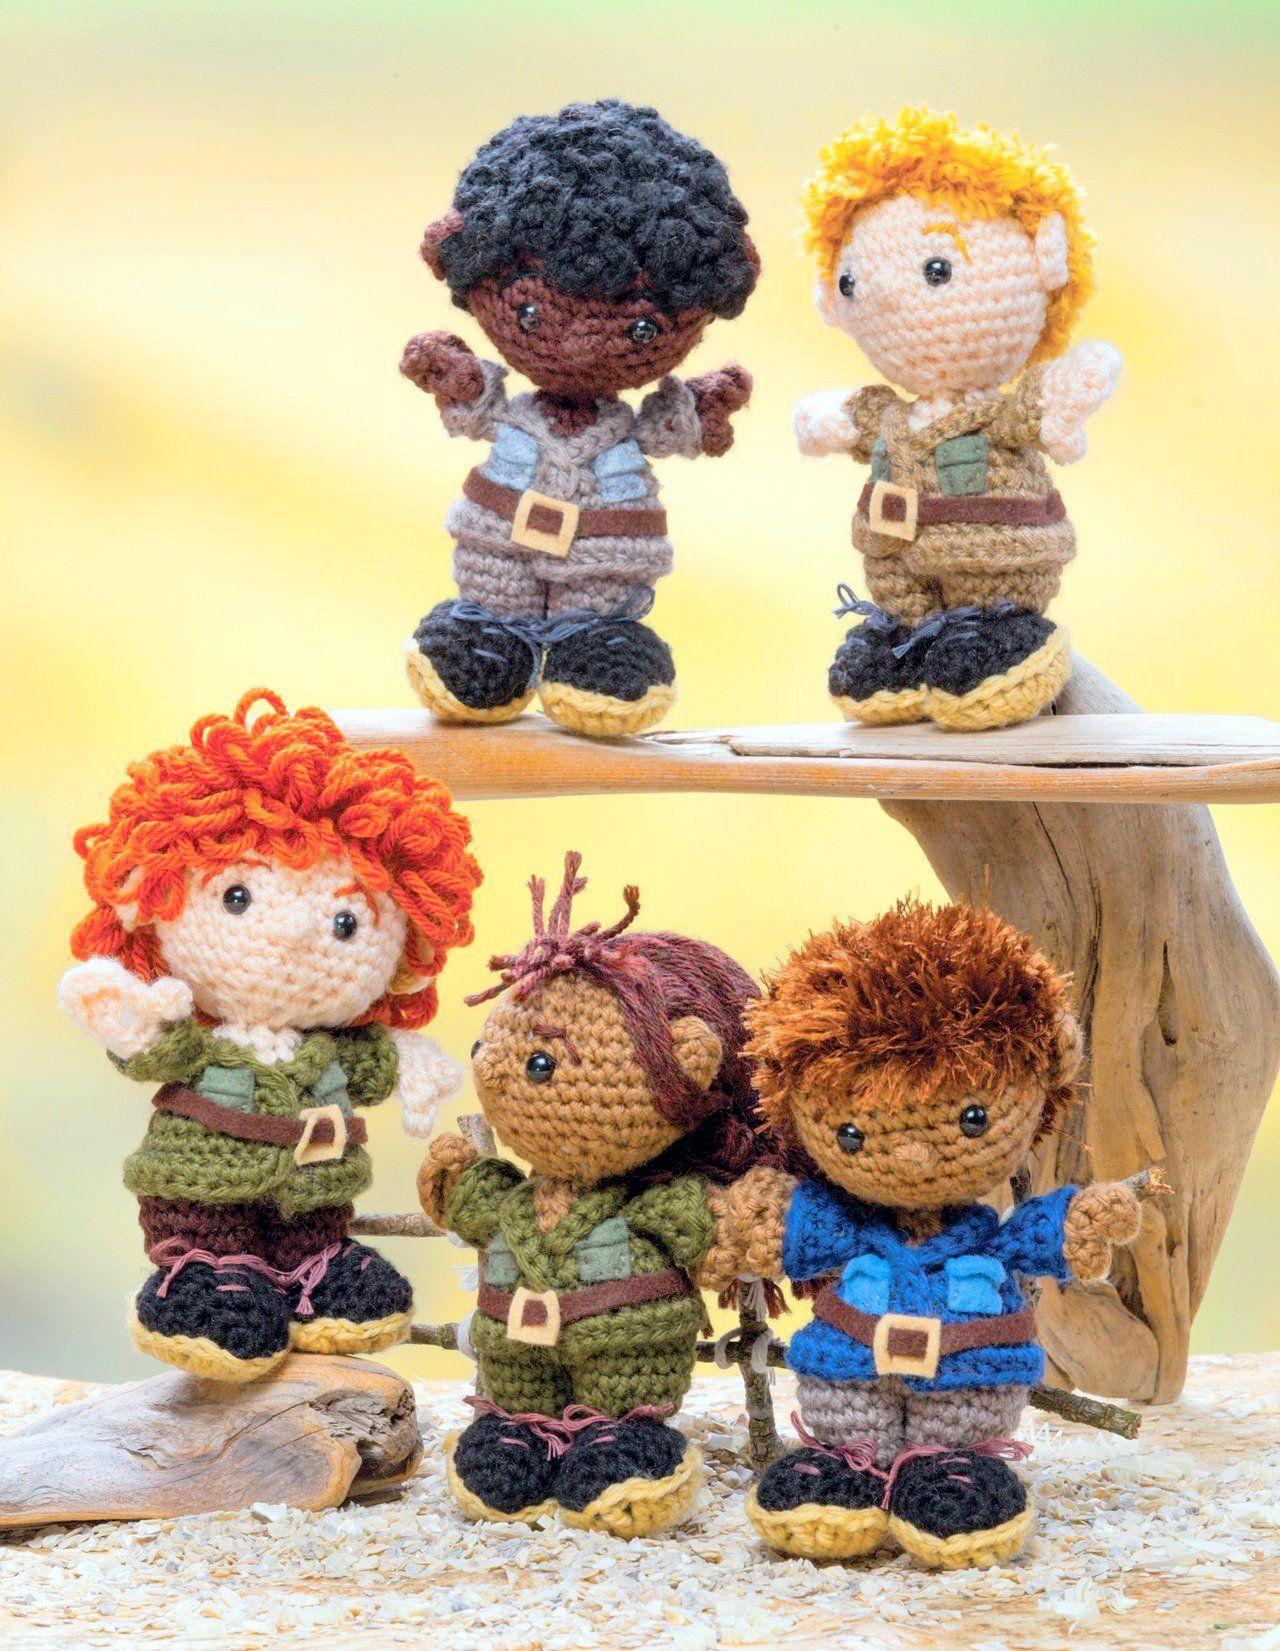 Funny amigurumi handmade knitted toys   Premium Photo   1651x1280